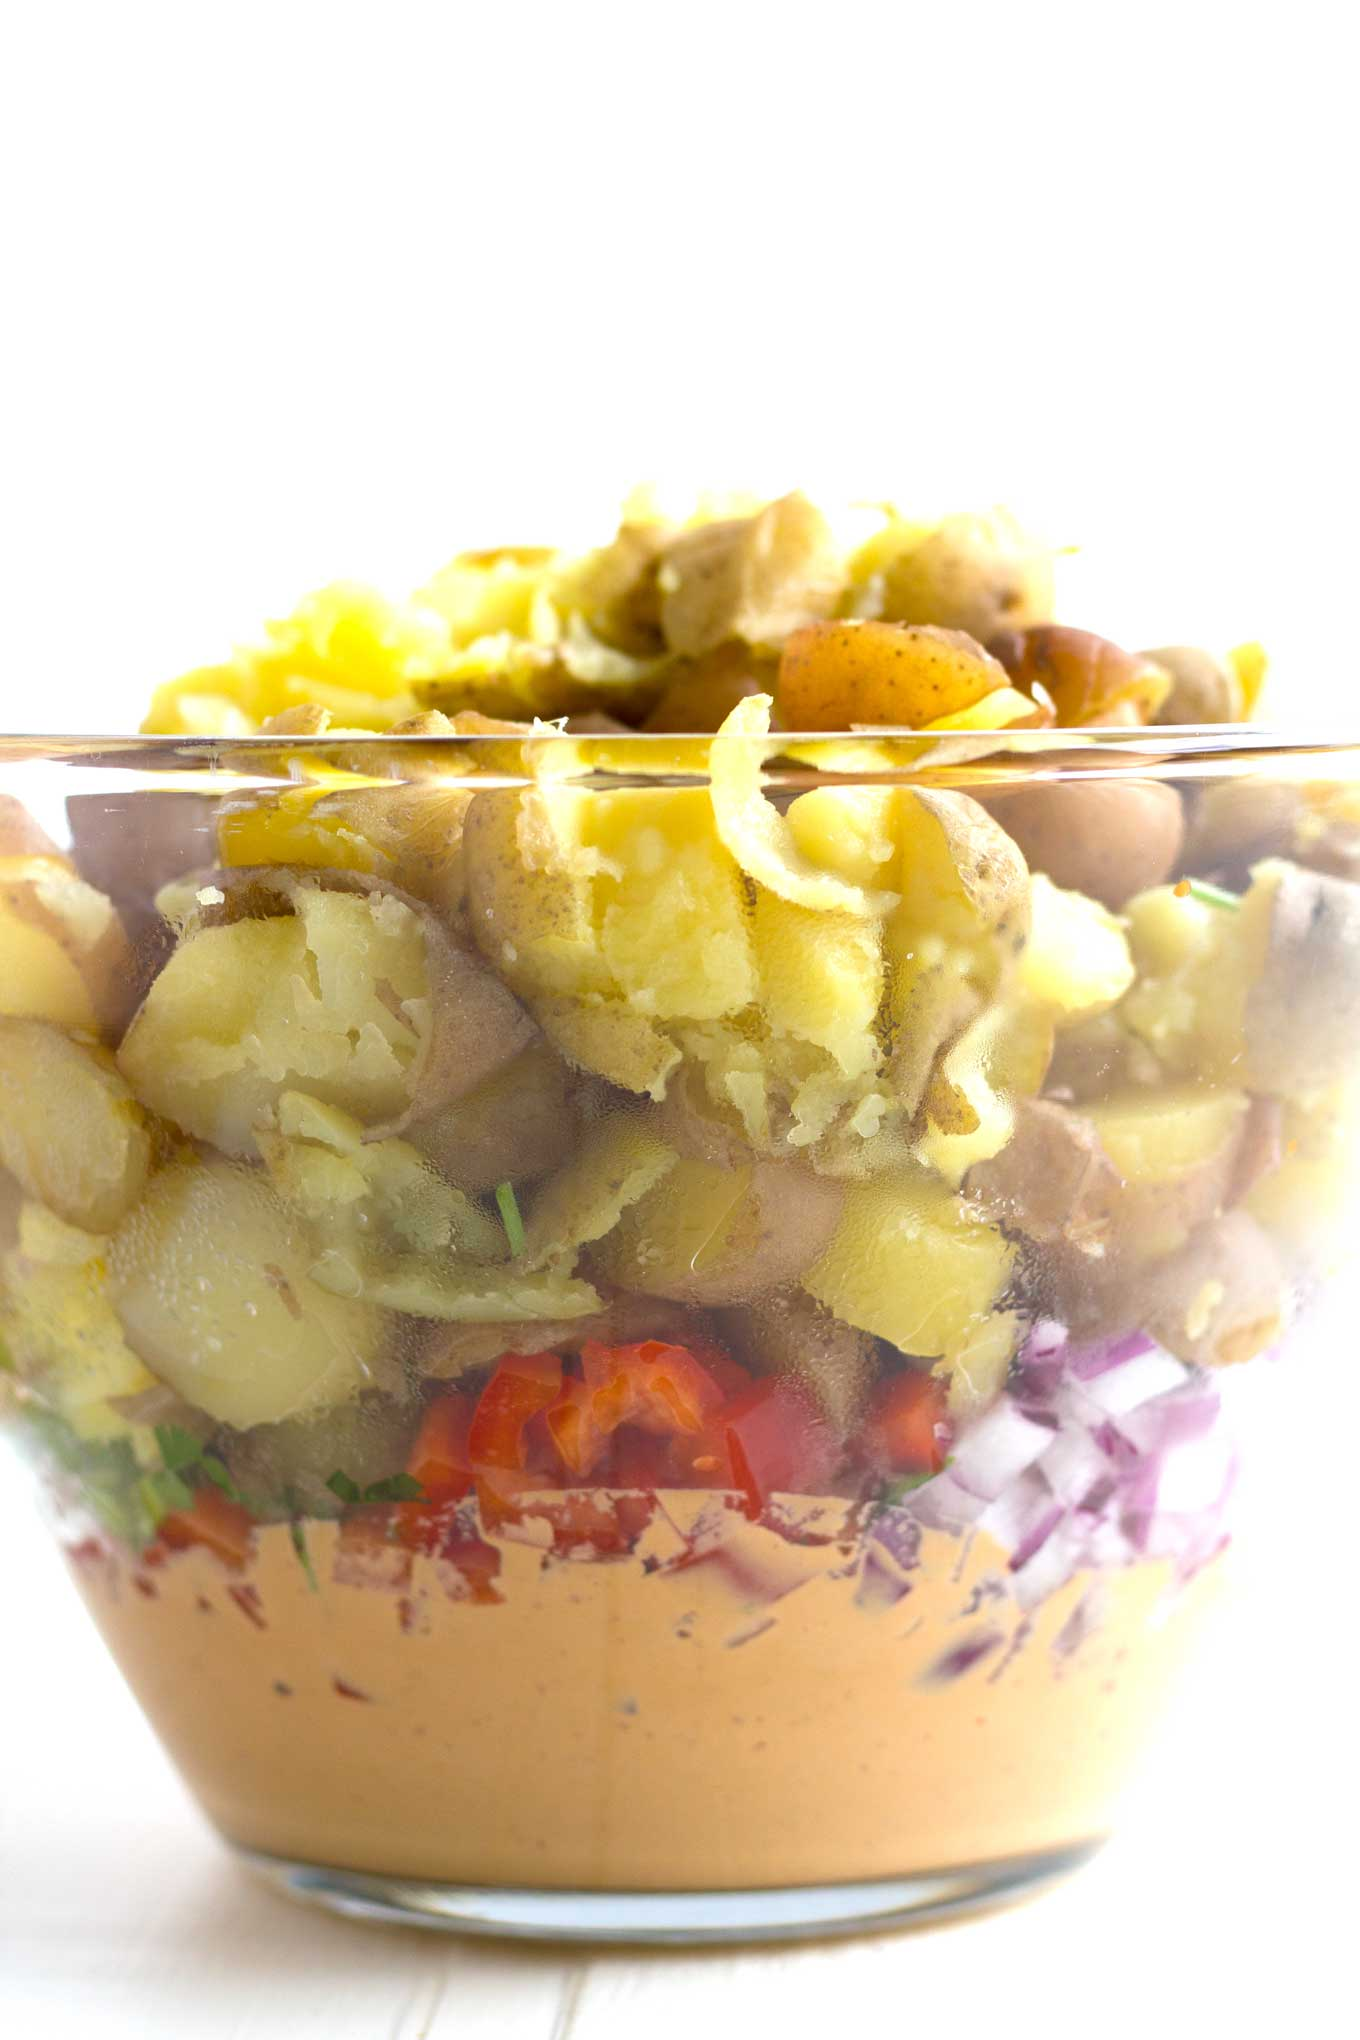 Vegan Southwestern Potato Salad | Oil-Free, Gluten-Free | https://passtheplants.com